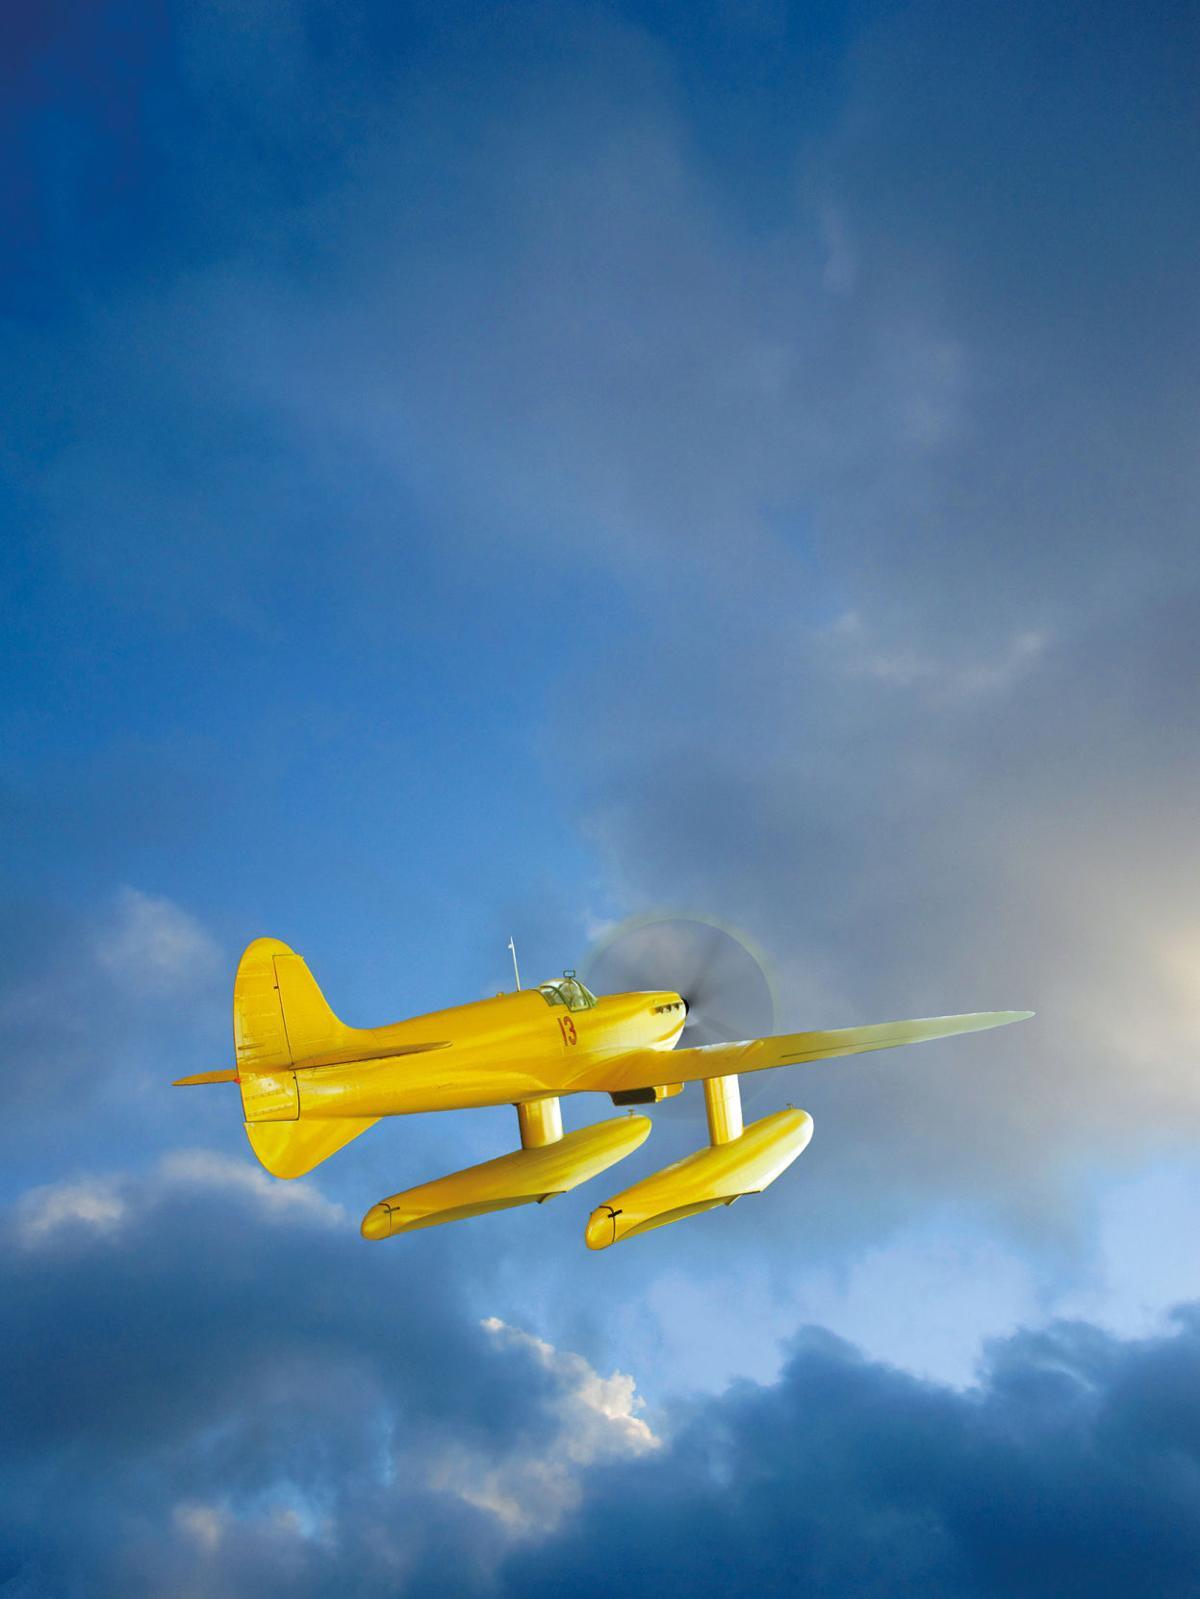 Flights of fancy: Patrick Nagatani's